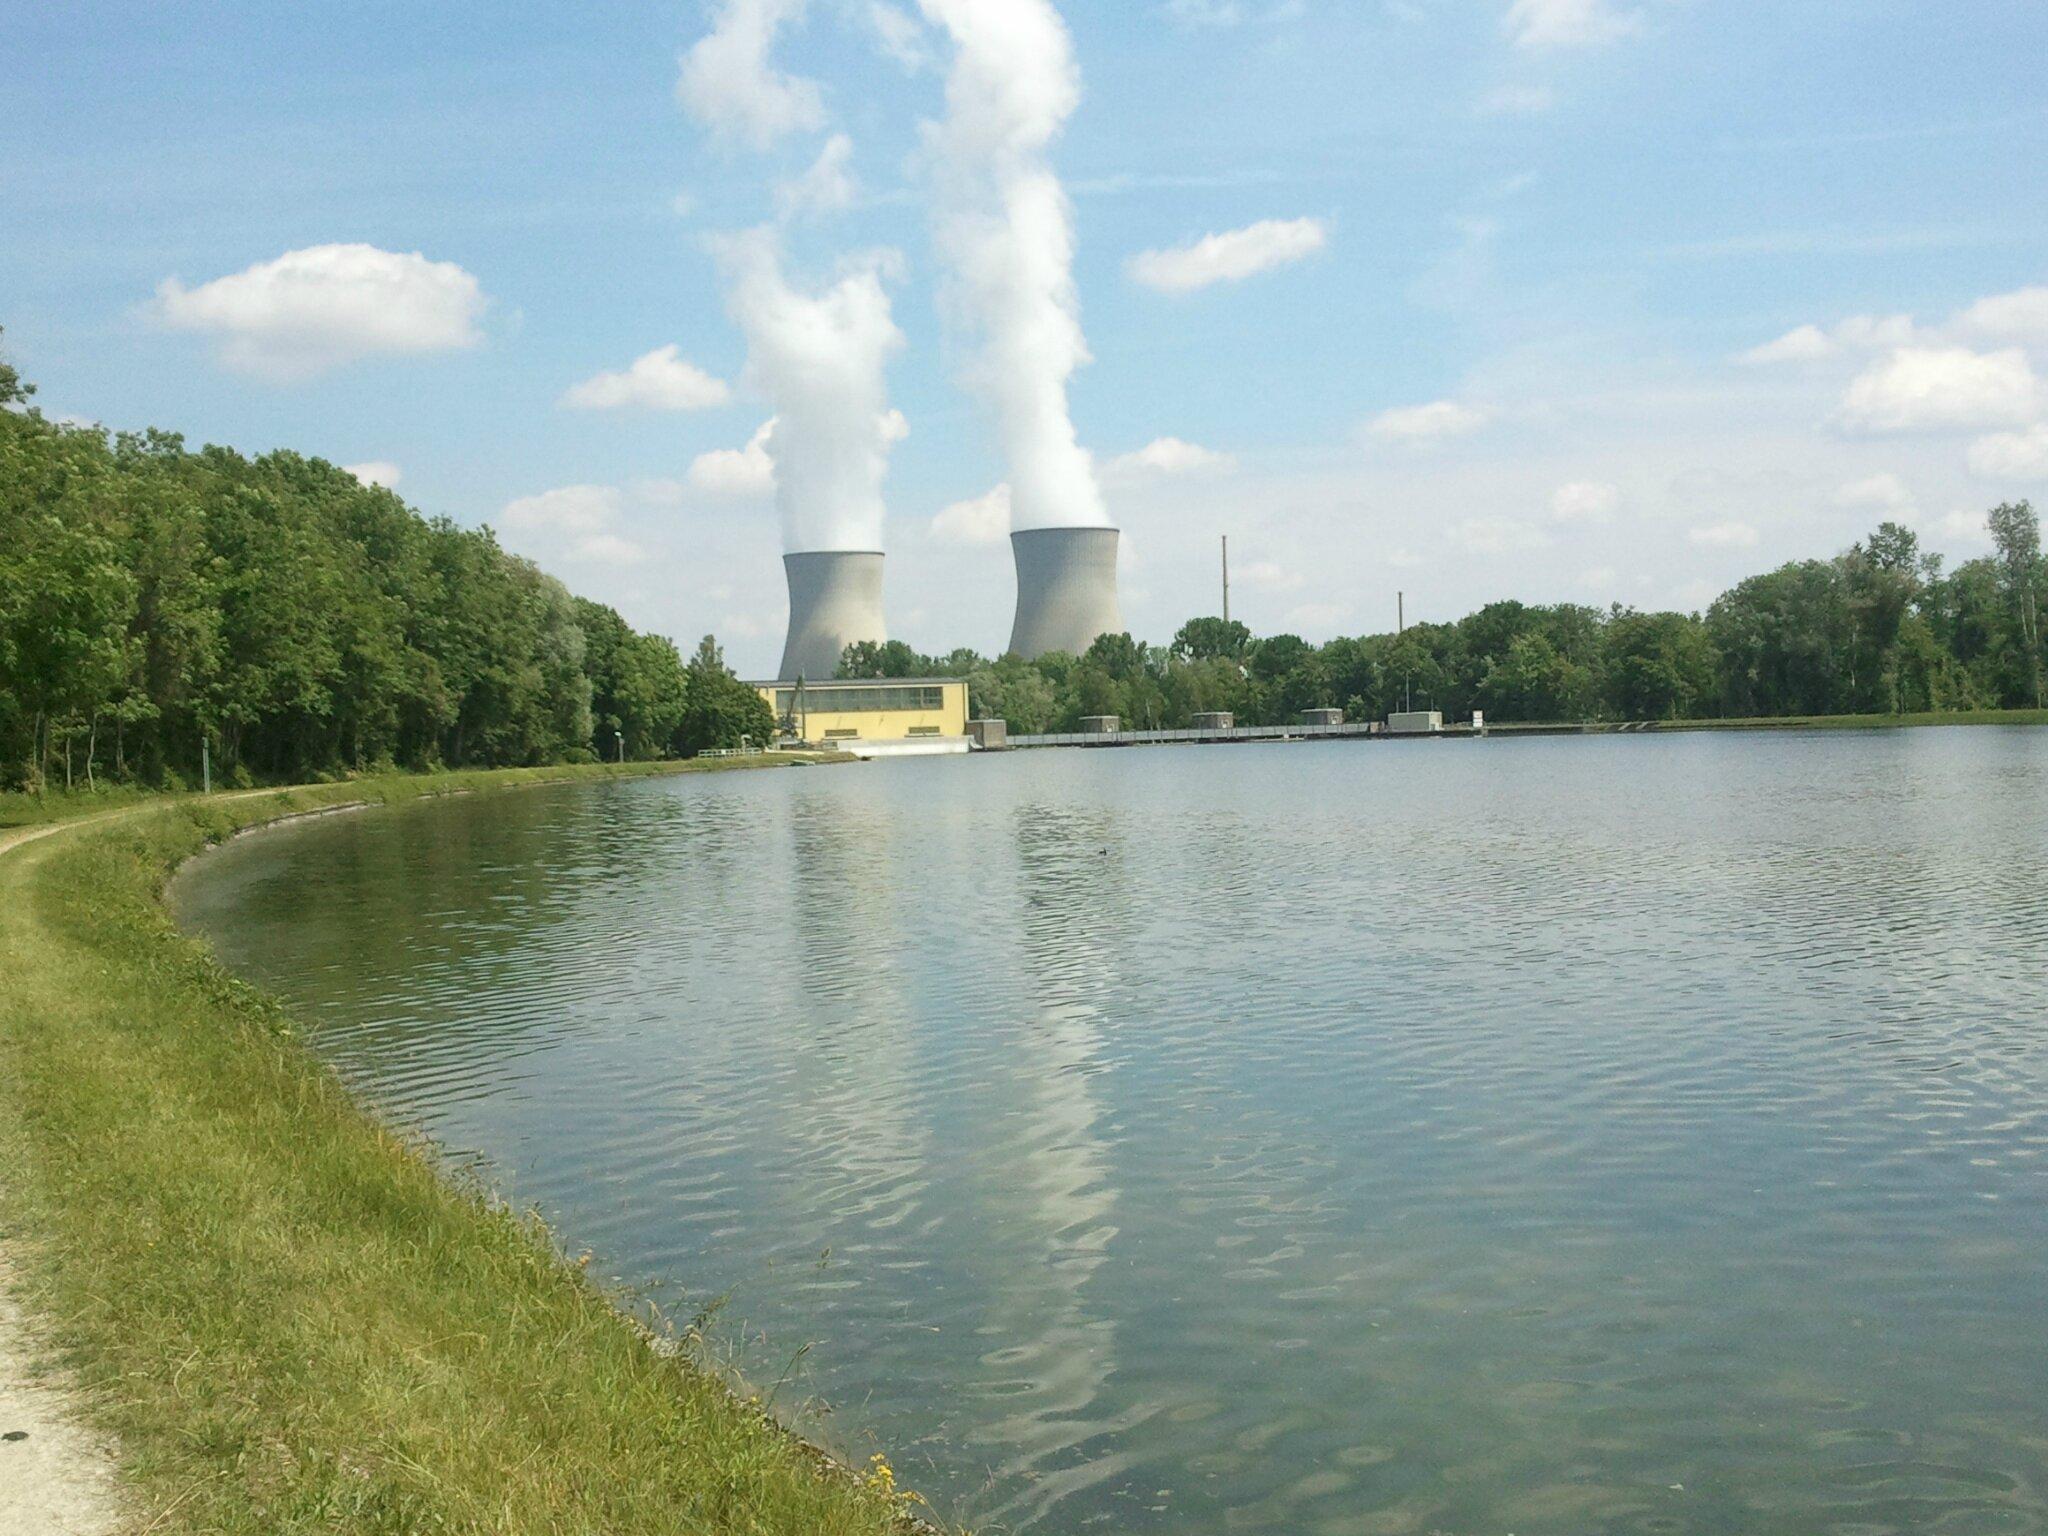 3-5 juin : Le Danube bleu : notre fil conducteur